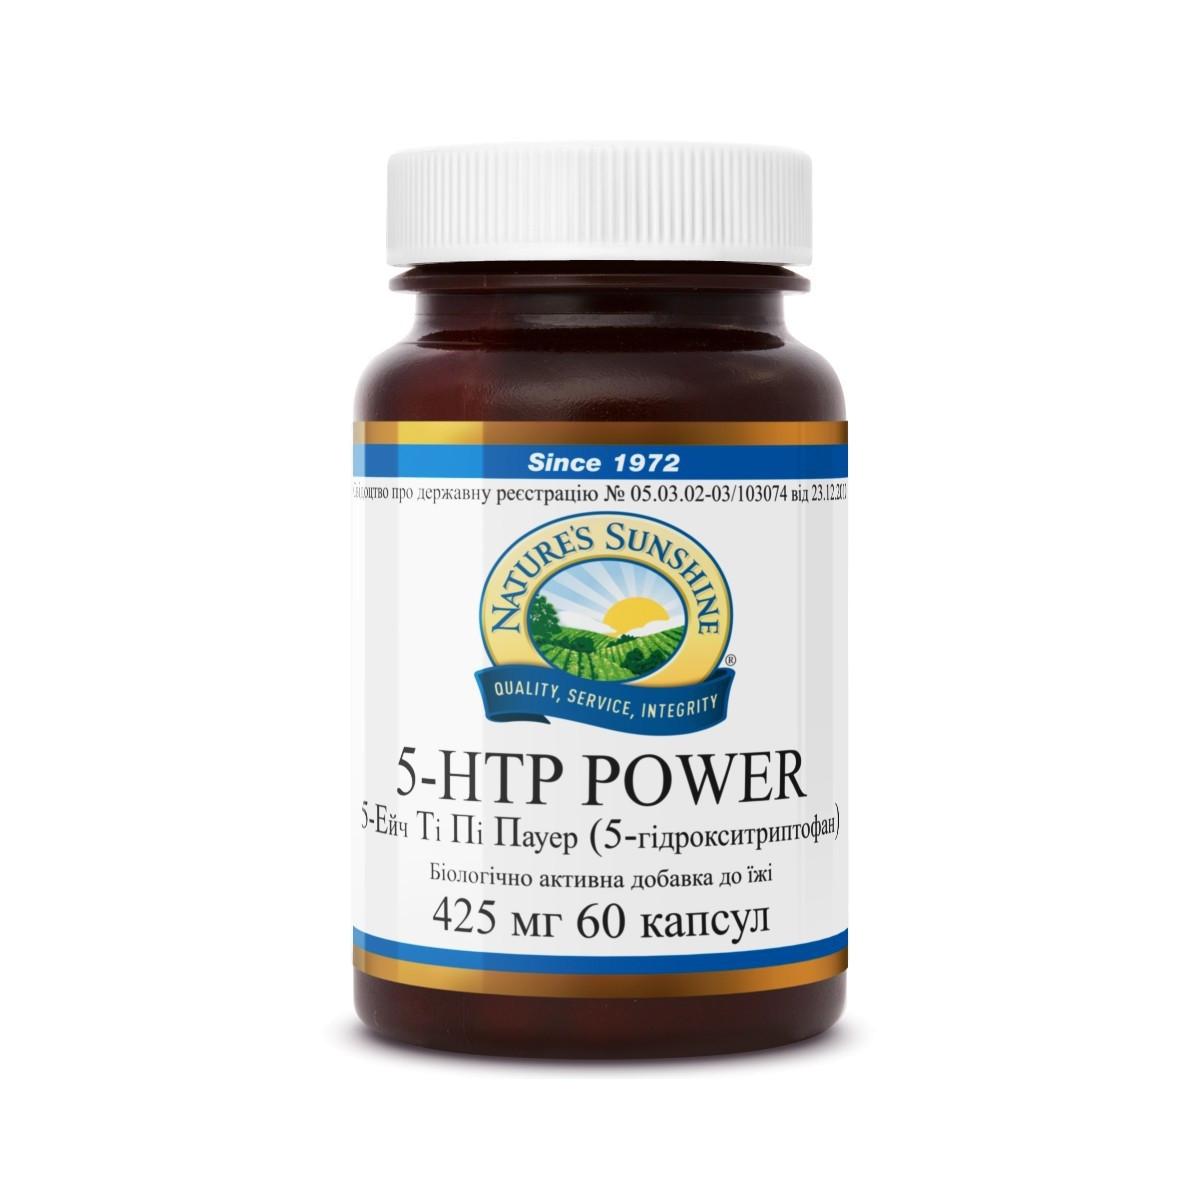 Антидепрессант без рецепта. 5 гидрокситриптофан БАД, триптофан, серотонин.